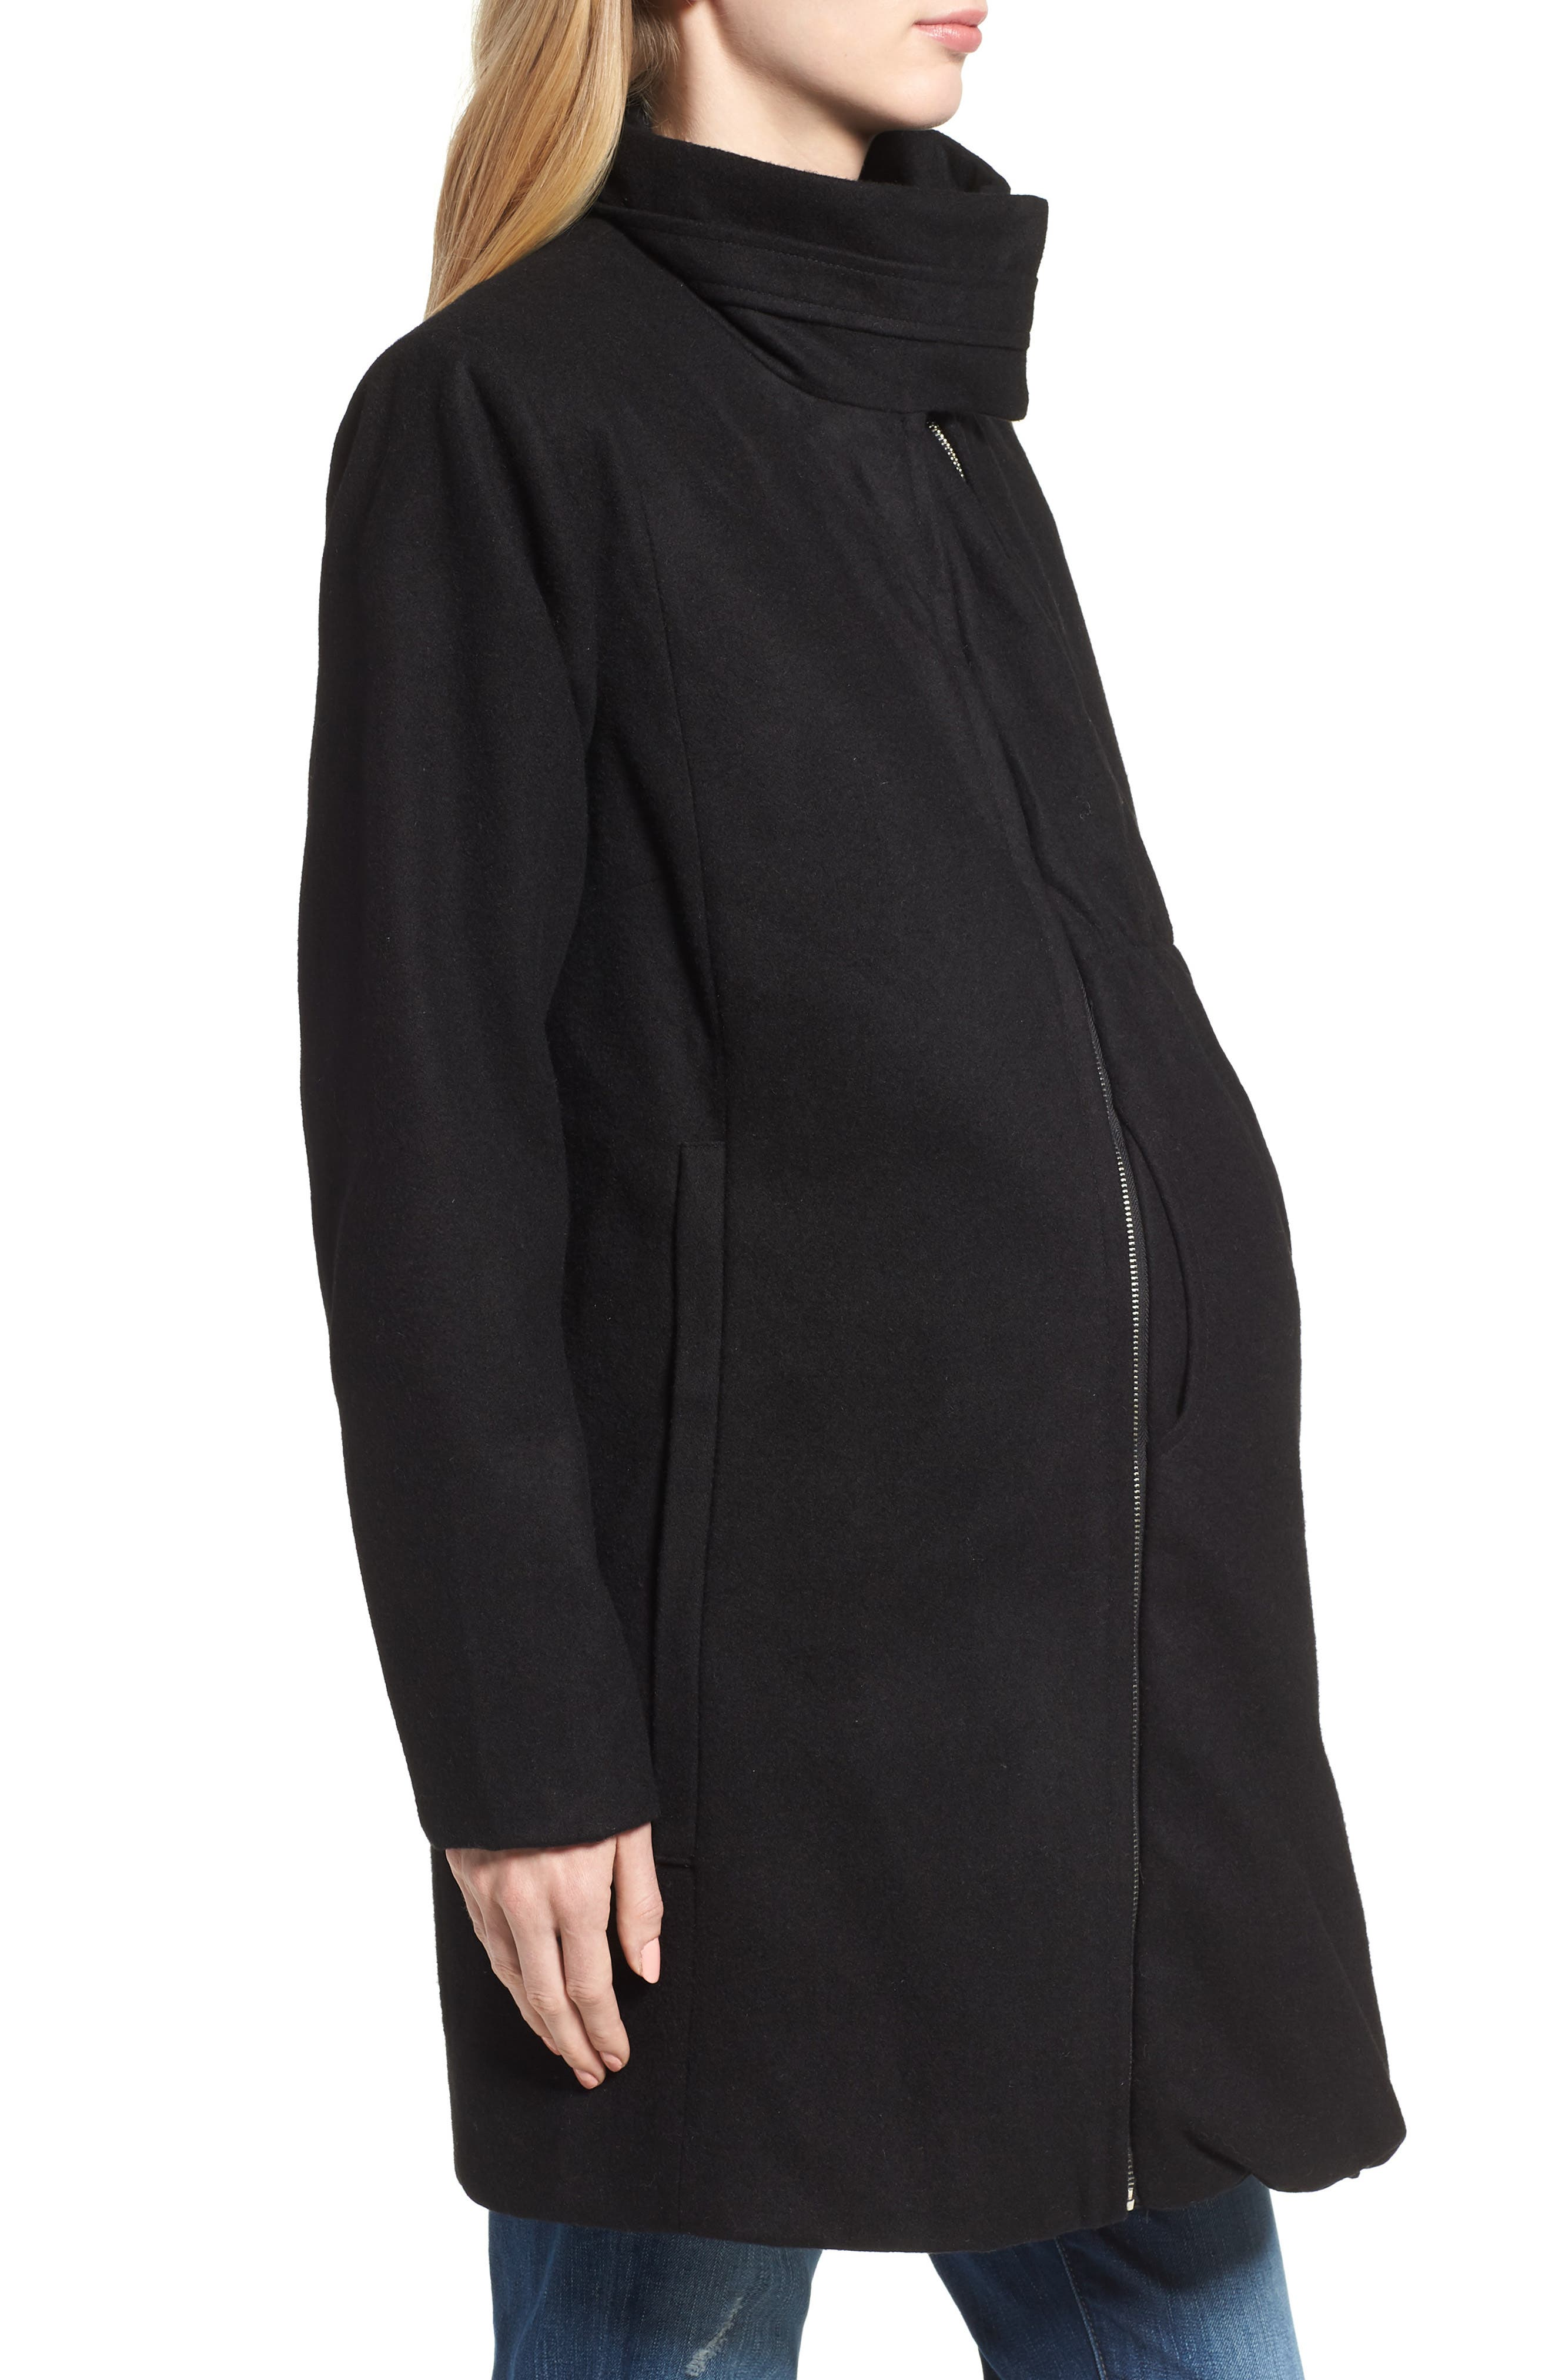 Convertible 3-in-1 Maternity/Nursing Coat,                             Alternate thumbnail 4, color,                             BLACK